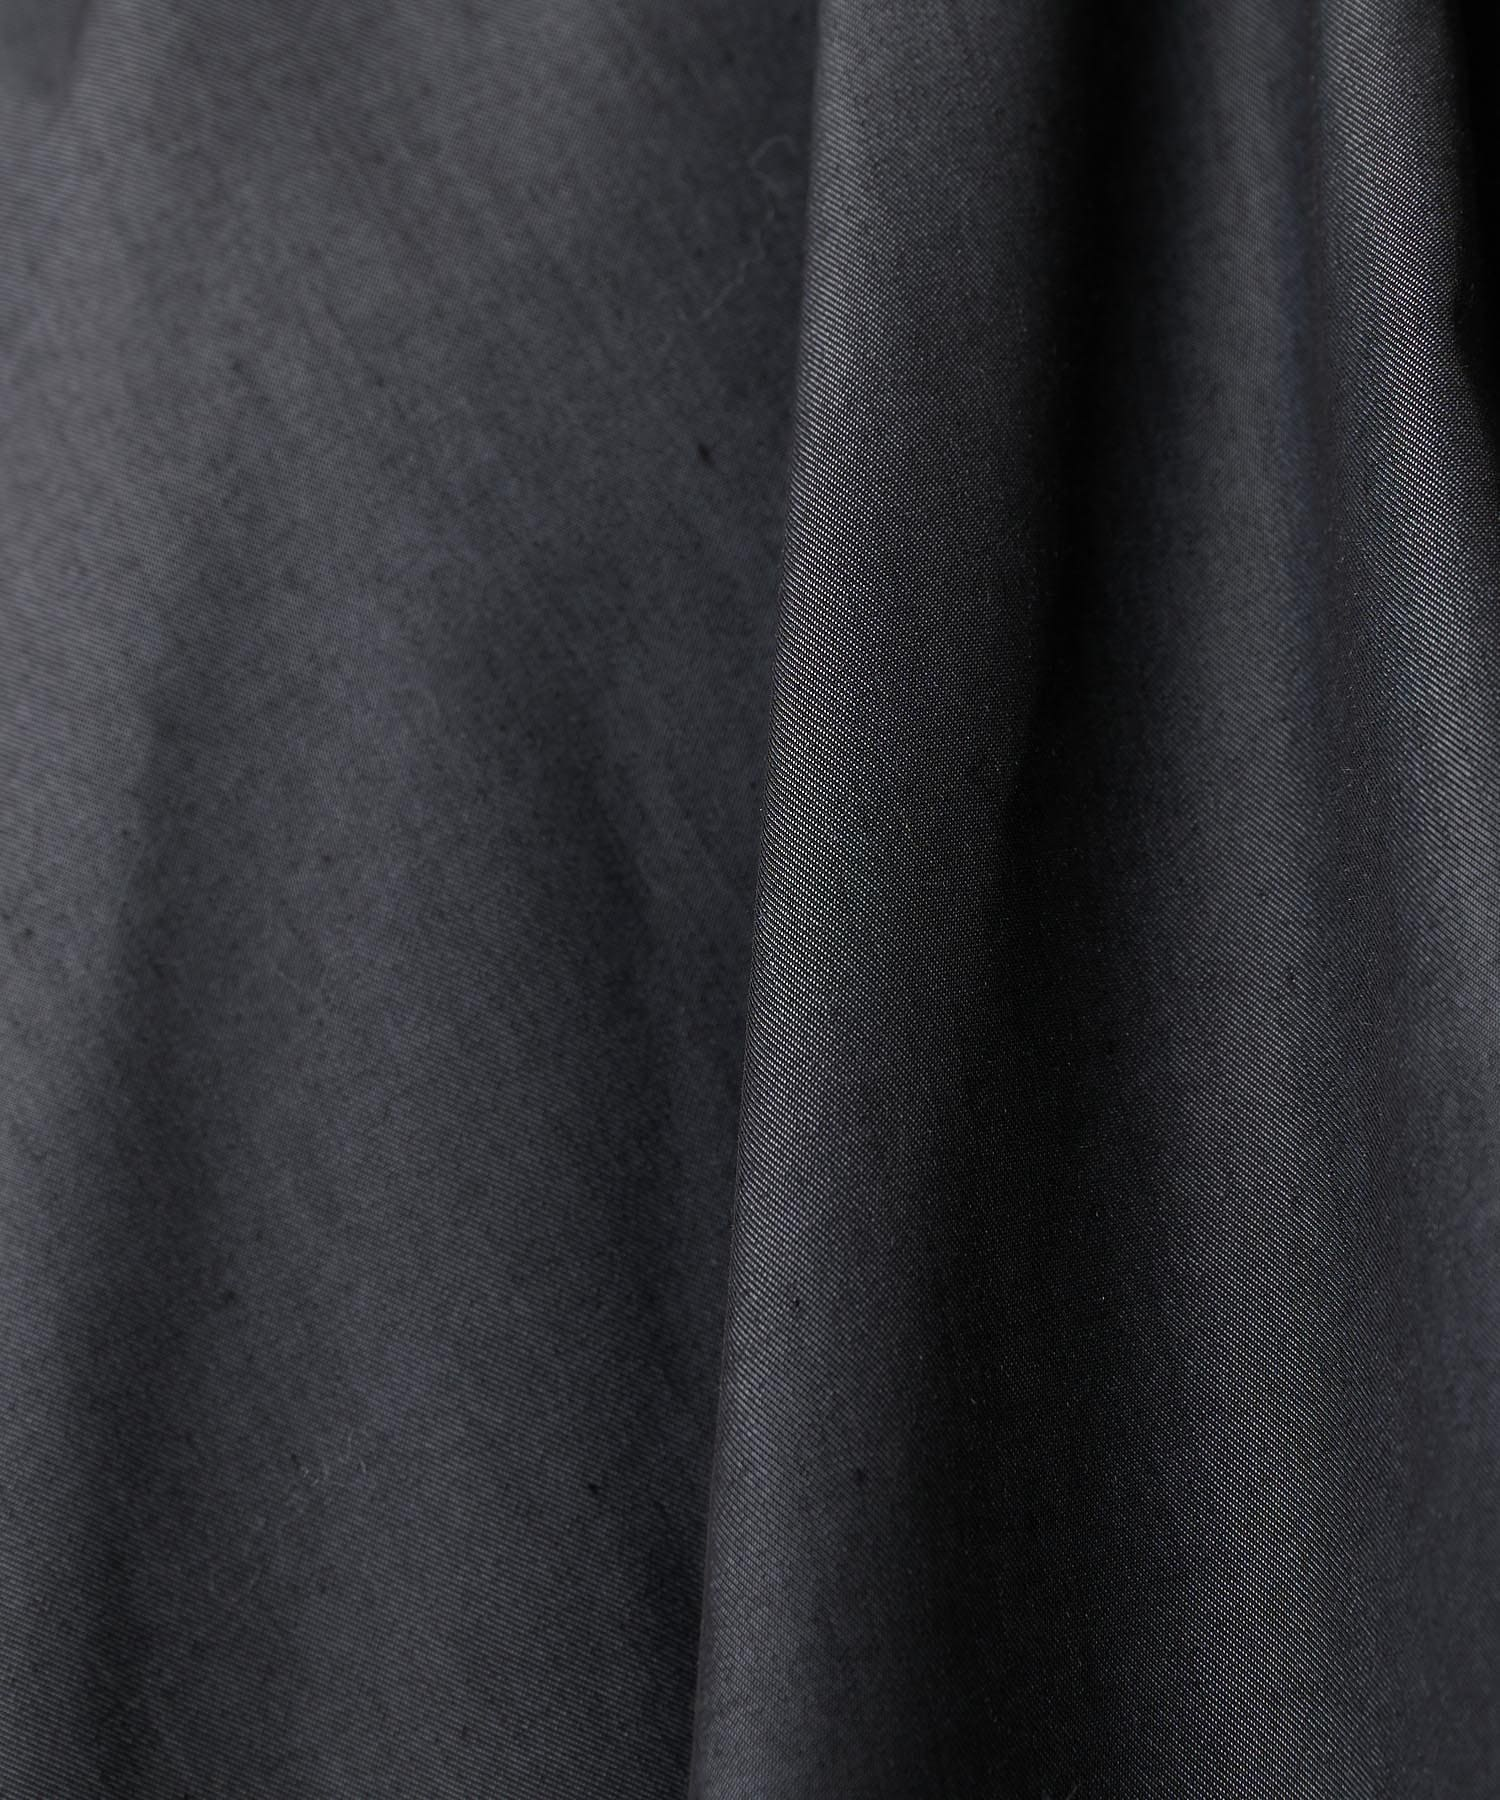 COLLAGE GALLARDAGALANTE(コラージュ ガリャルダガランテ) スカートライクリバーシブルパンツ